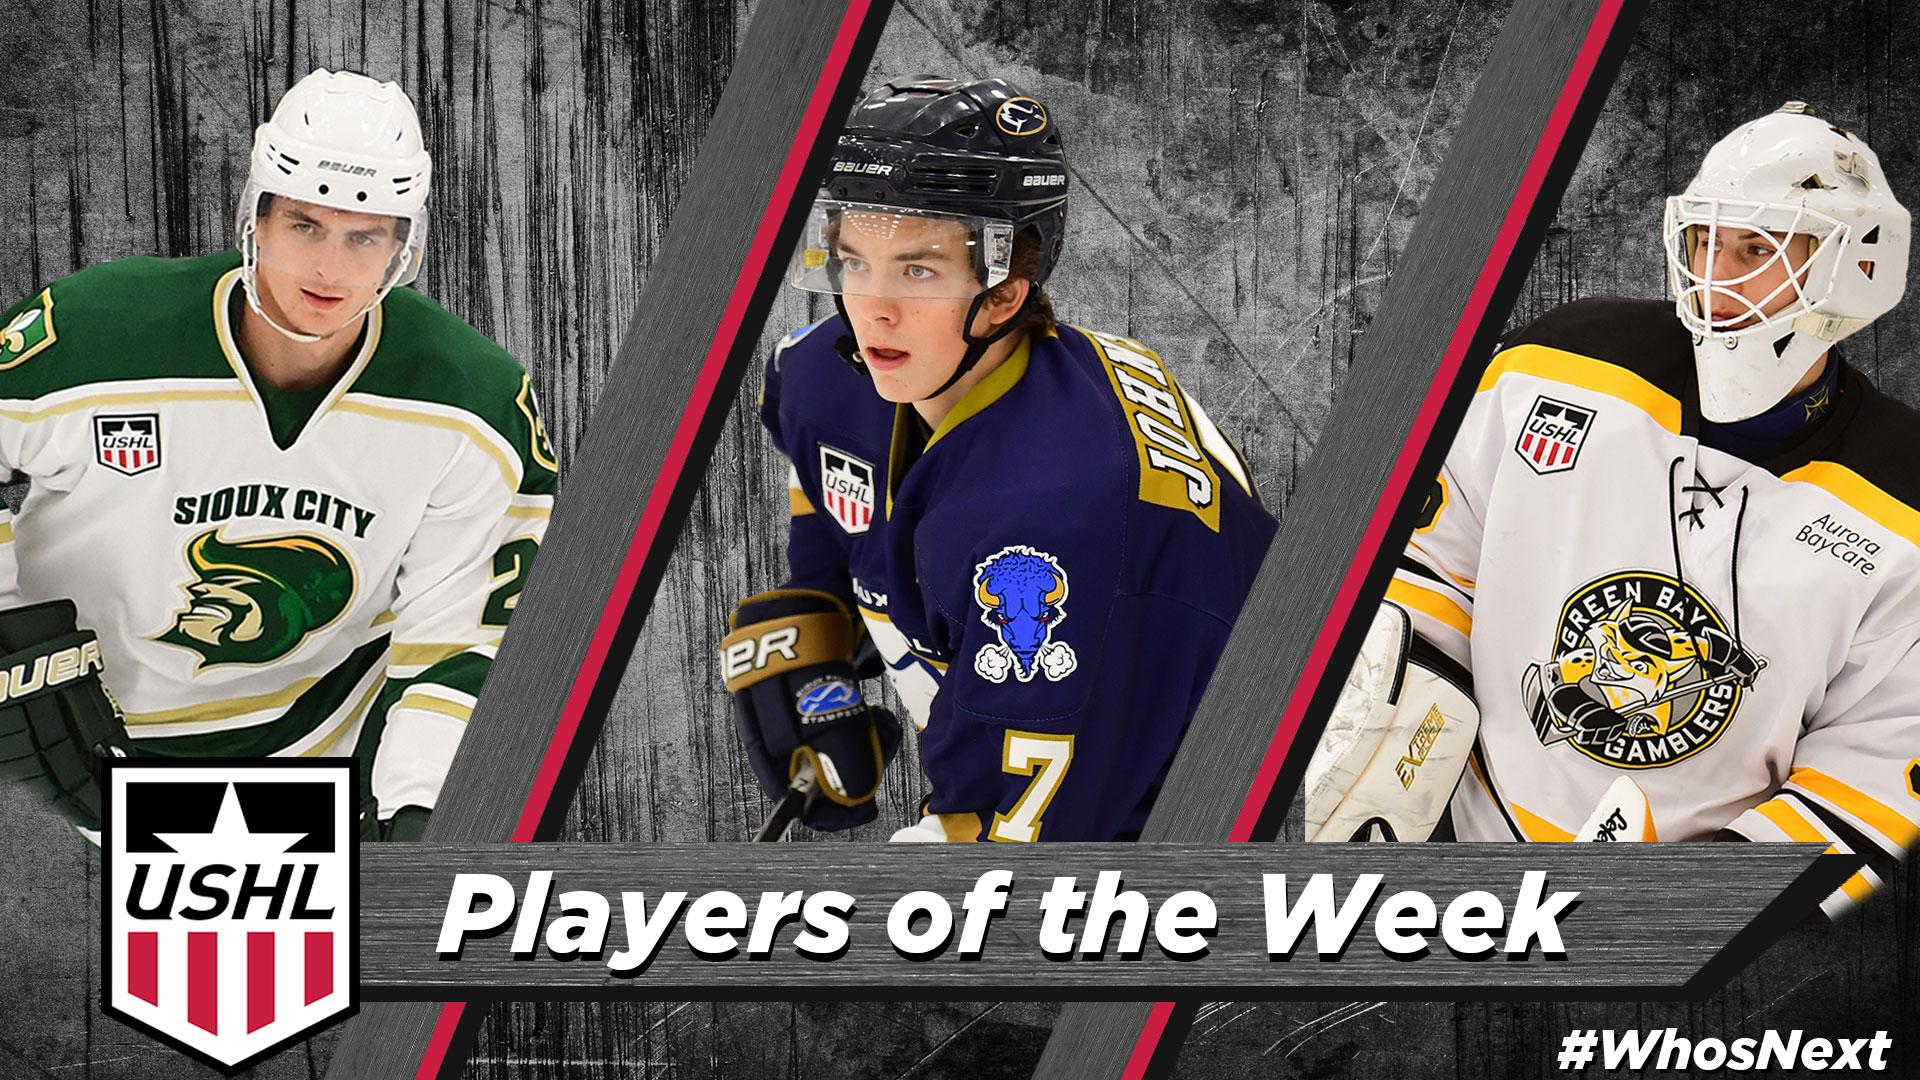 USHL: USHL Players Of The Week - Week 4, 2018-19